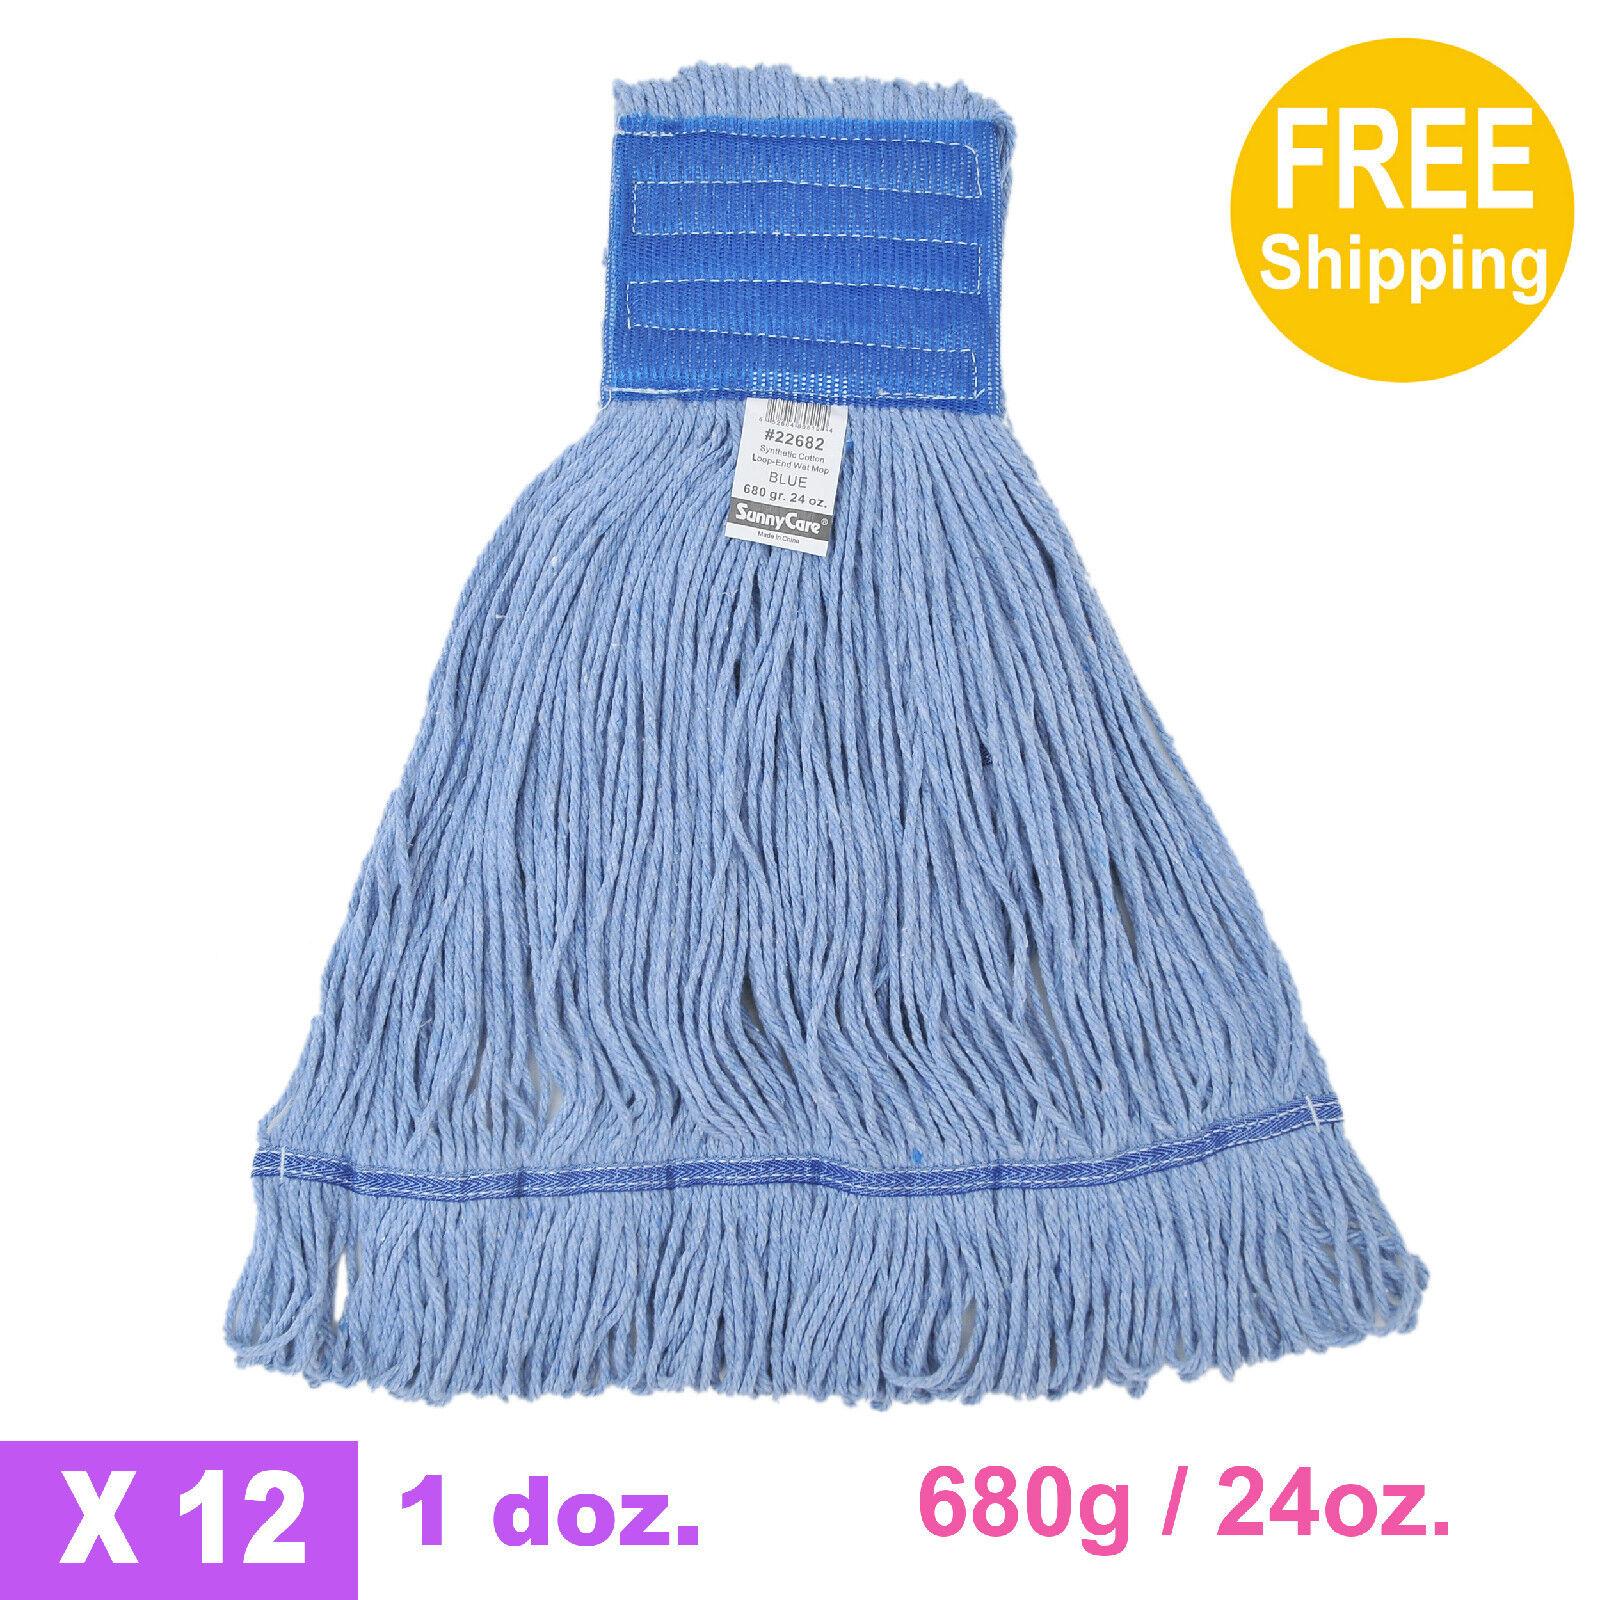 1doz. 680g 24oz. SunnyCare bluee Synthetic Cotton Loop-End Wet Mops 12 CS